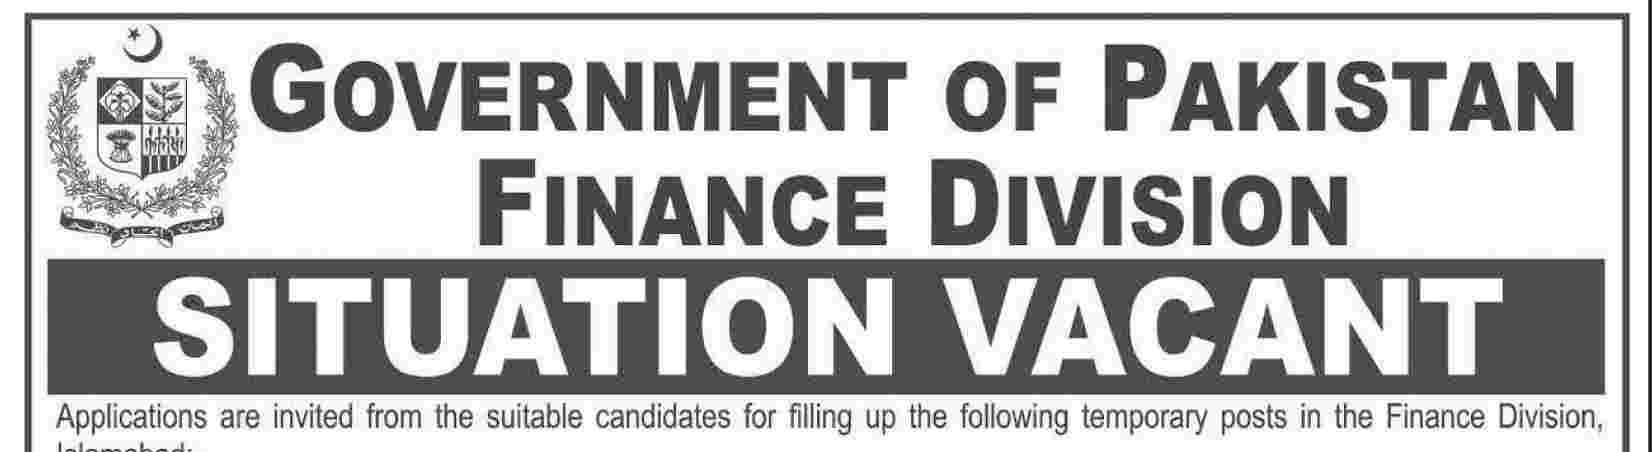 Govt Of Pakistan Finance Division Islamabad Jobs 2015 ApplicatiGovt Of Pakistan Finance Division Islamabad Jobs 2015 Application Form Last Date